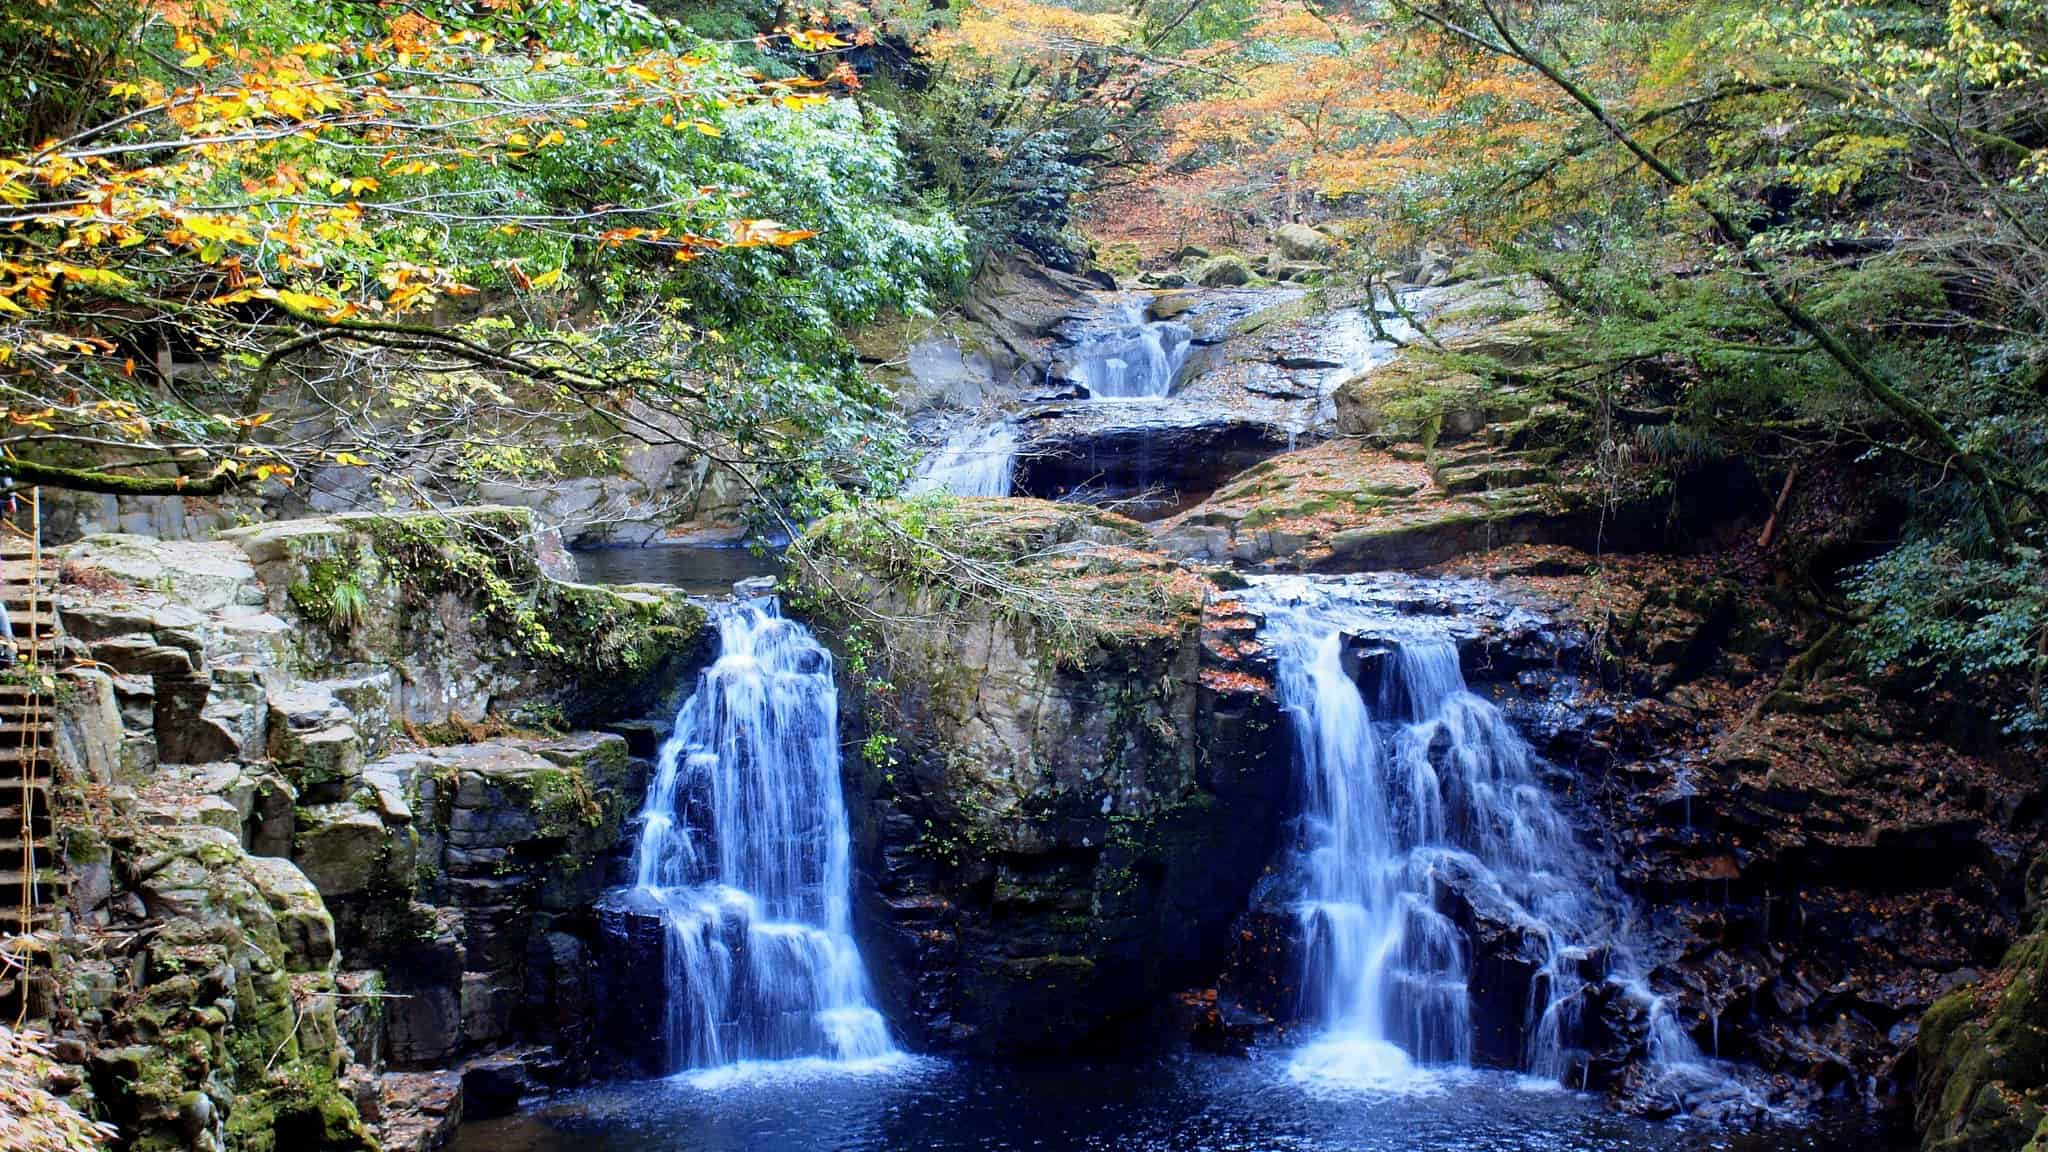 Waterfalls in Japan - Akame 48 Falls